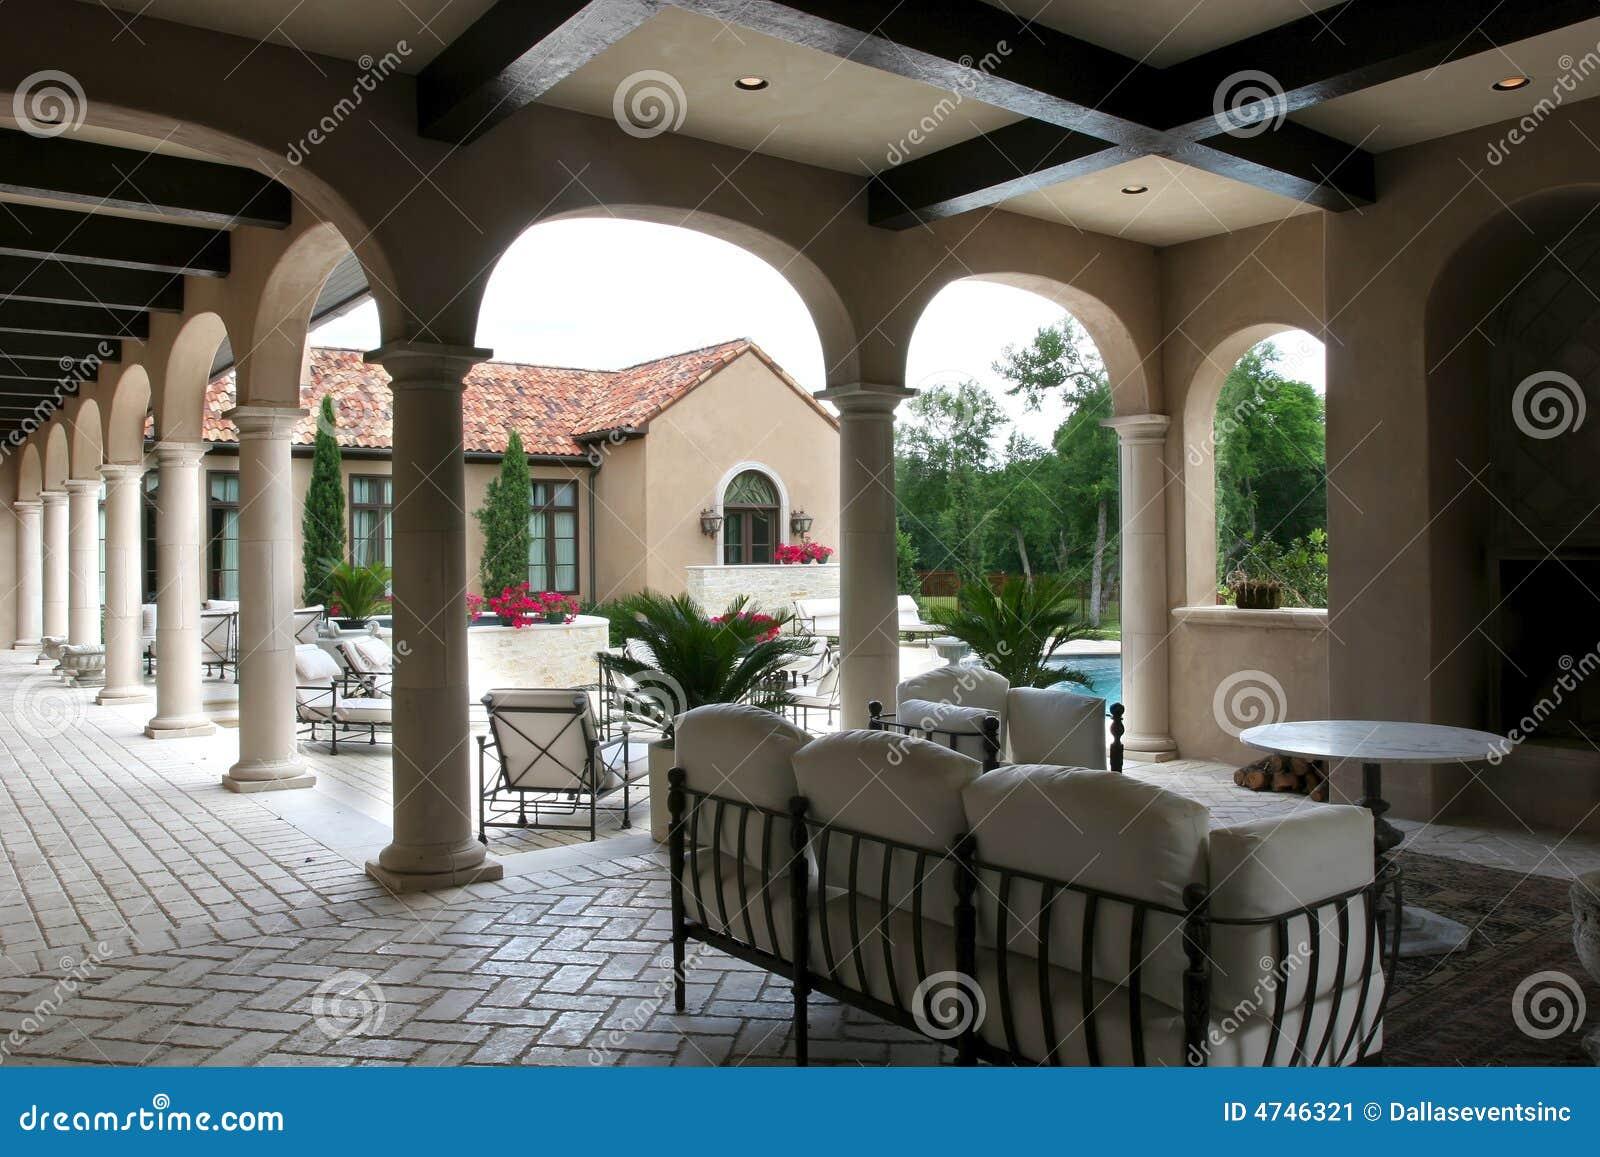 Luxury Spanish Style Home And Pool Stock Image Image